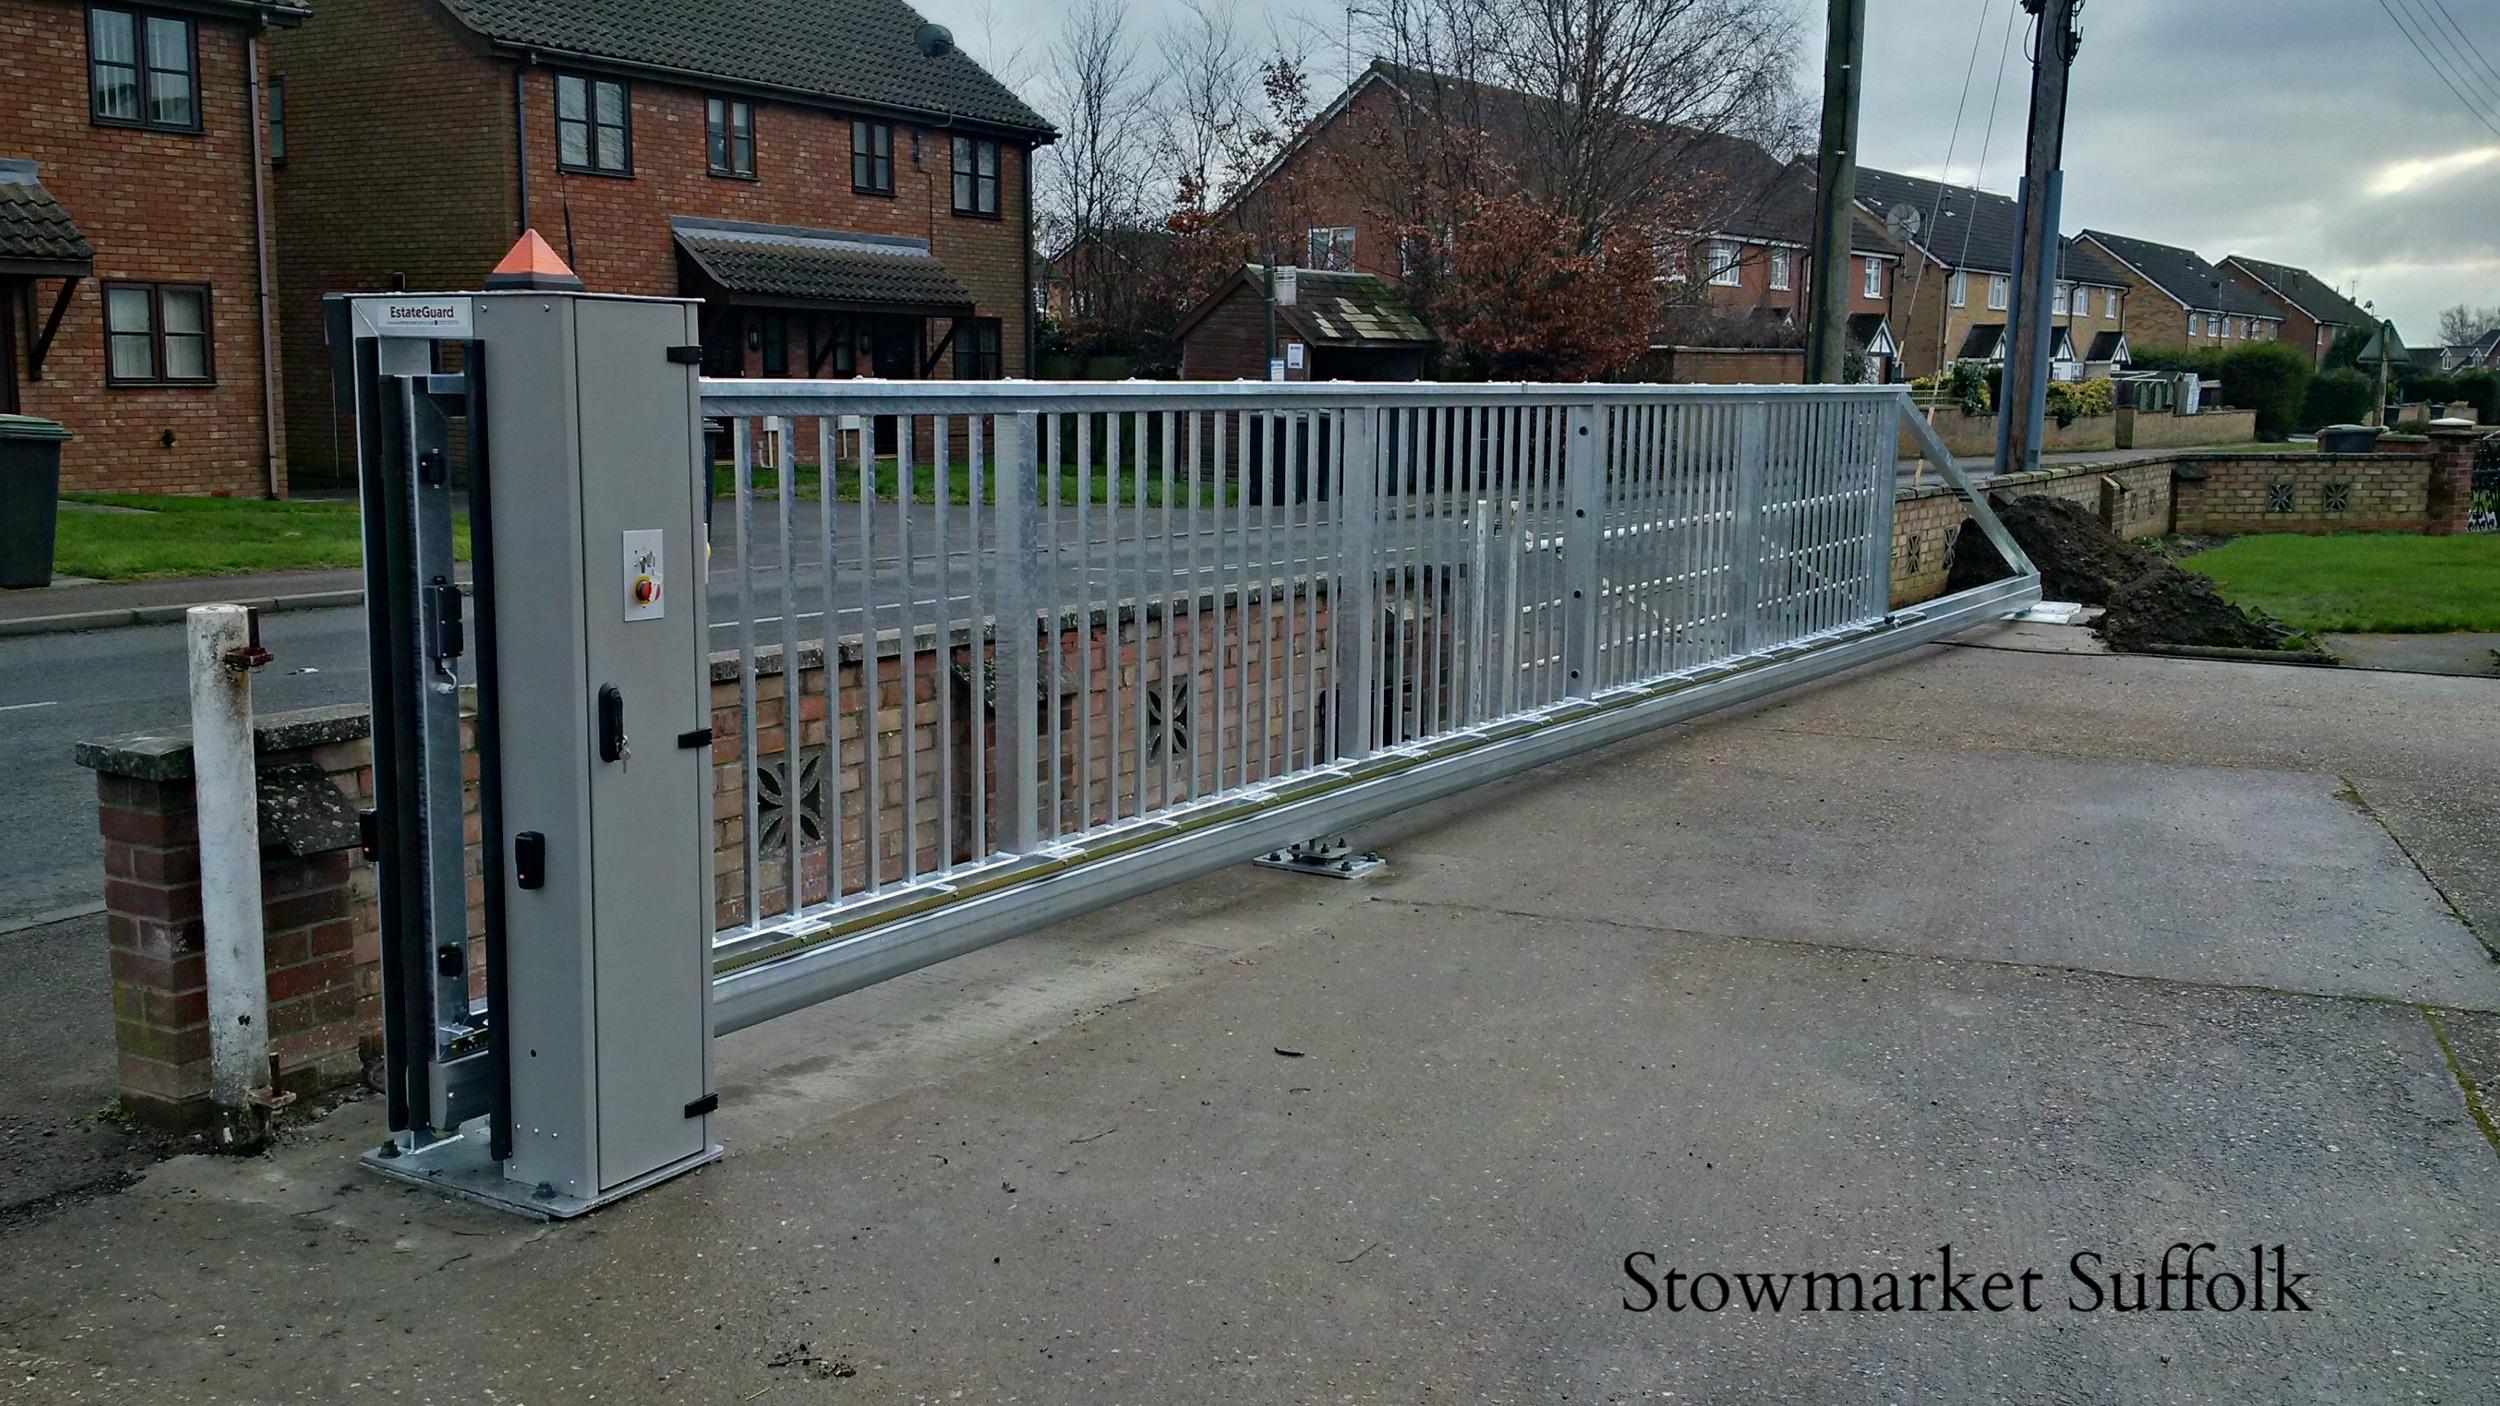 Copy of Stowmarket Suffolk